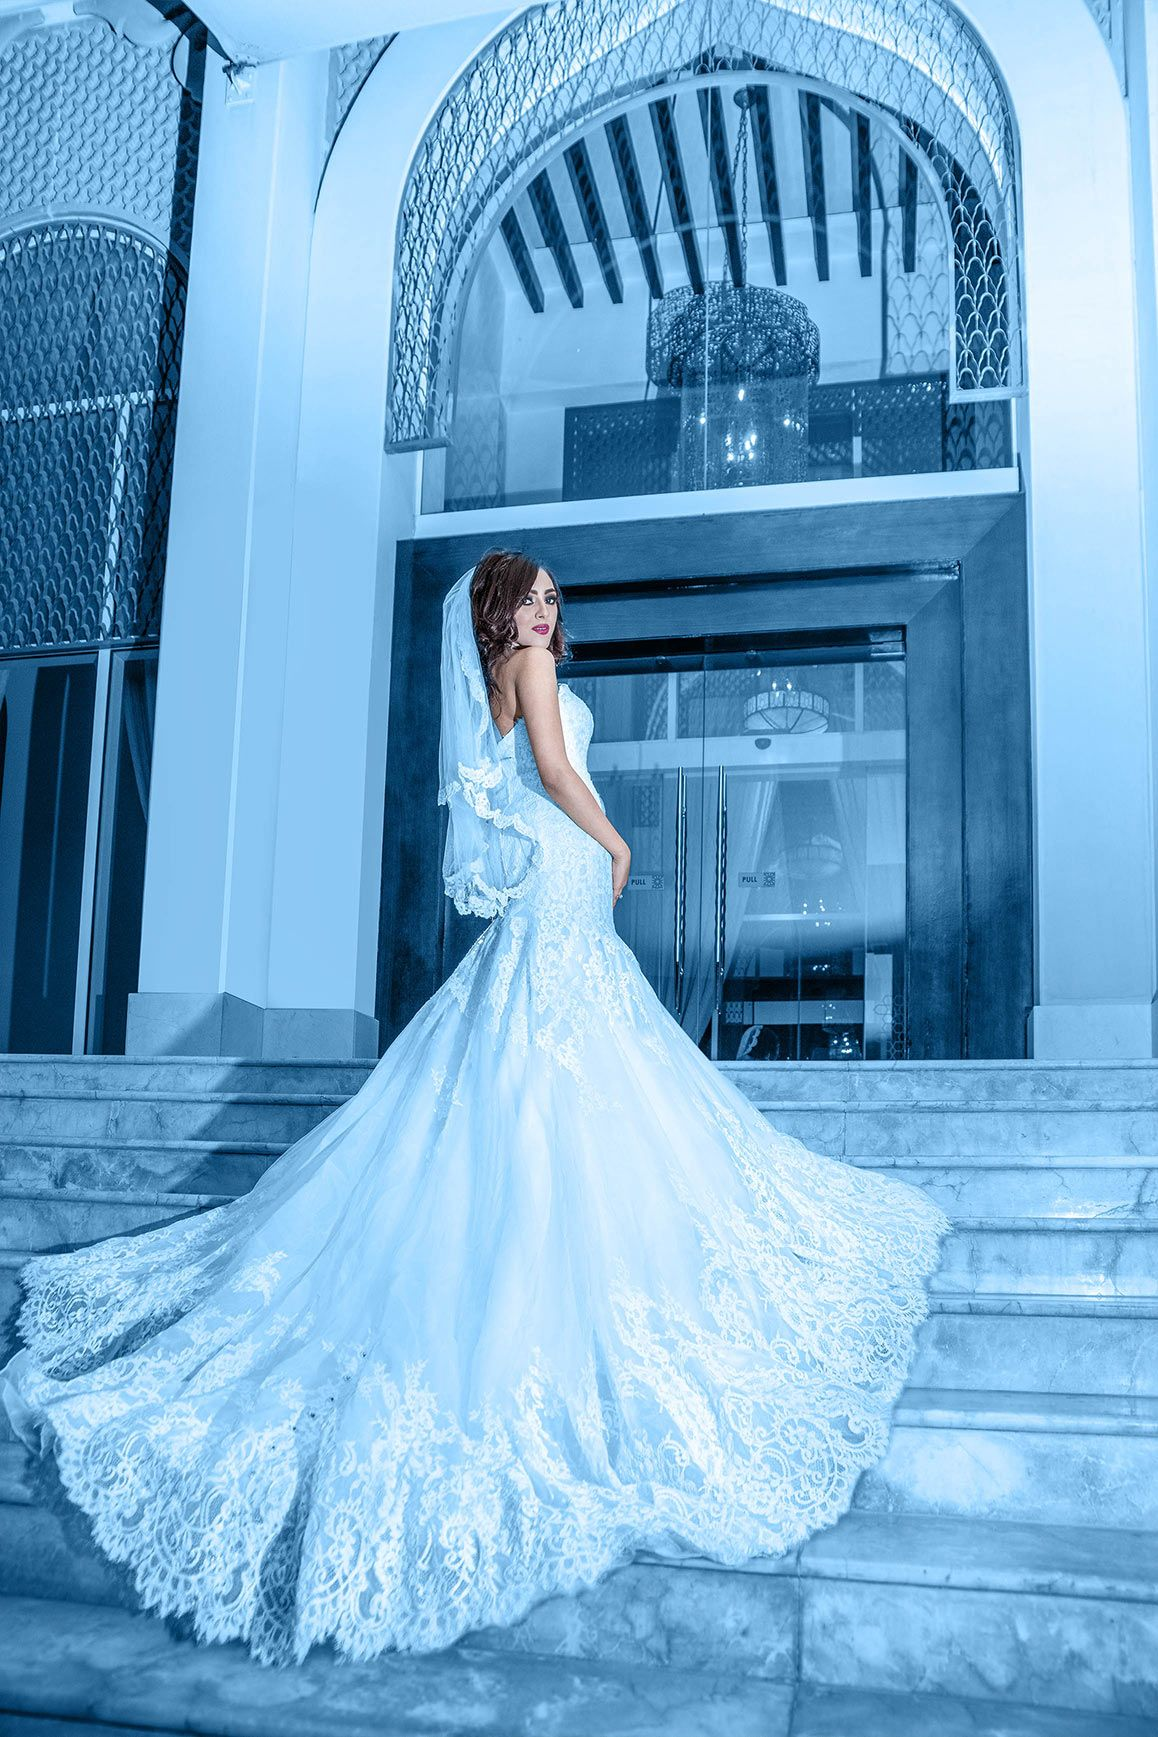 Wedding Nina Mommsen Photographer Bahrain Manama Professional Bride Dress Bride Photoshoot Wedding Dresses Wedding Gallery